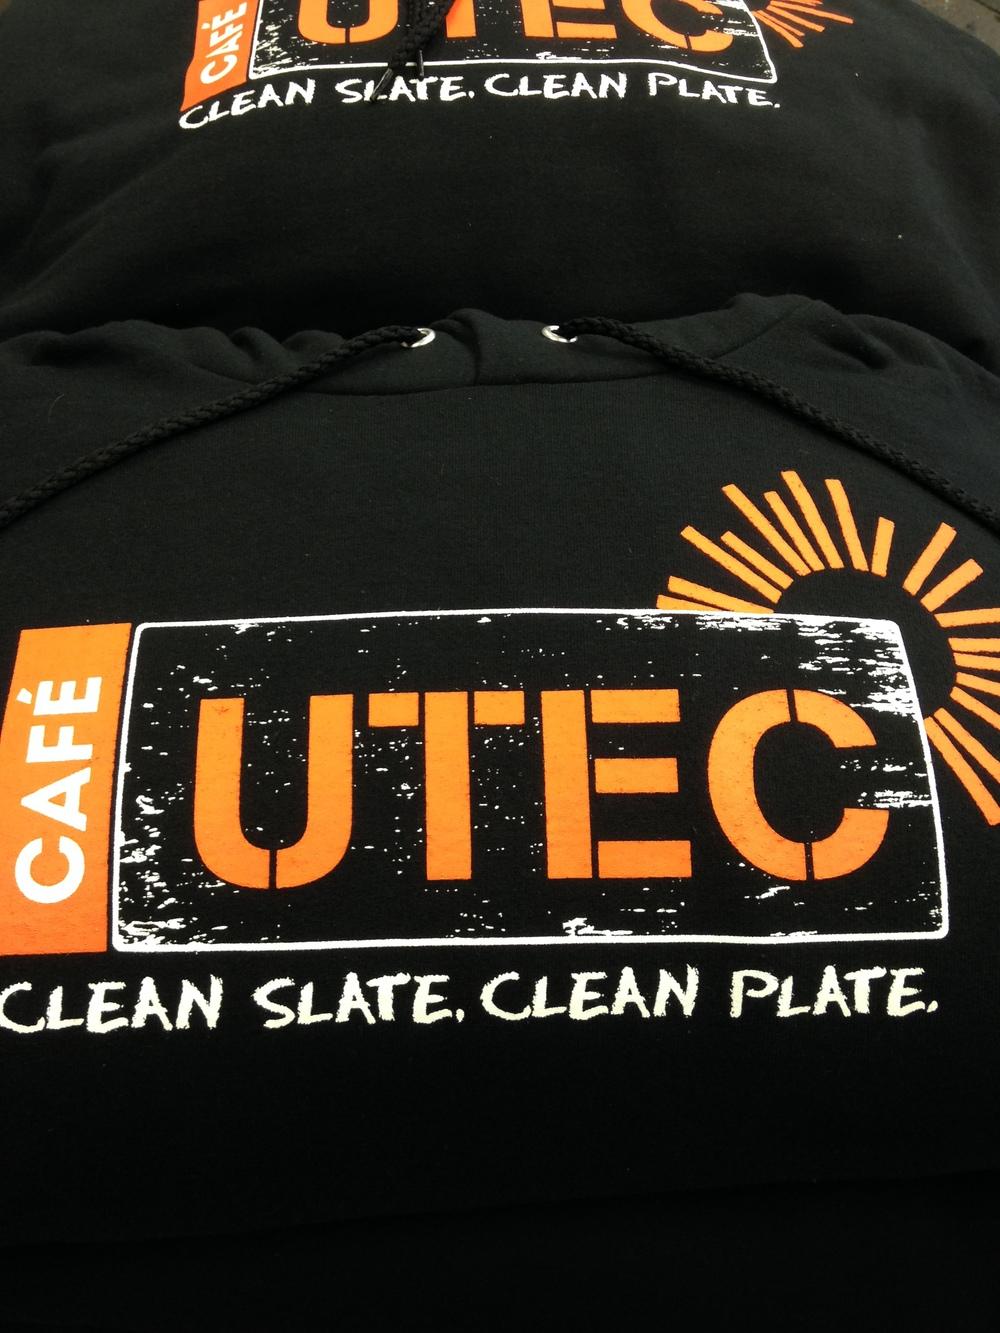 Cafe UTEC 1.JPG